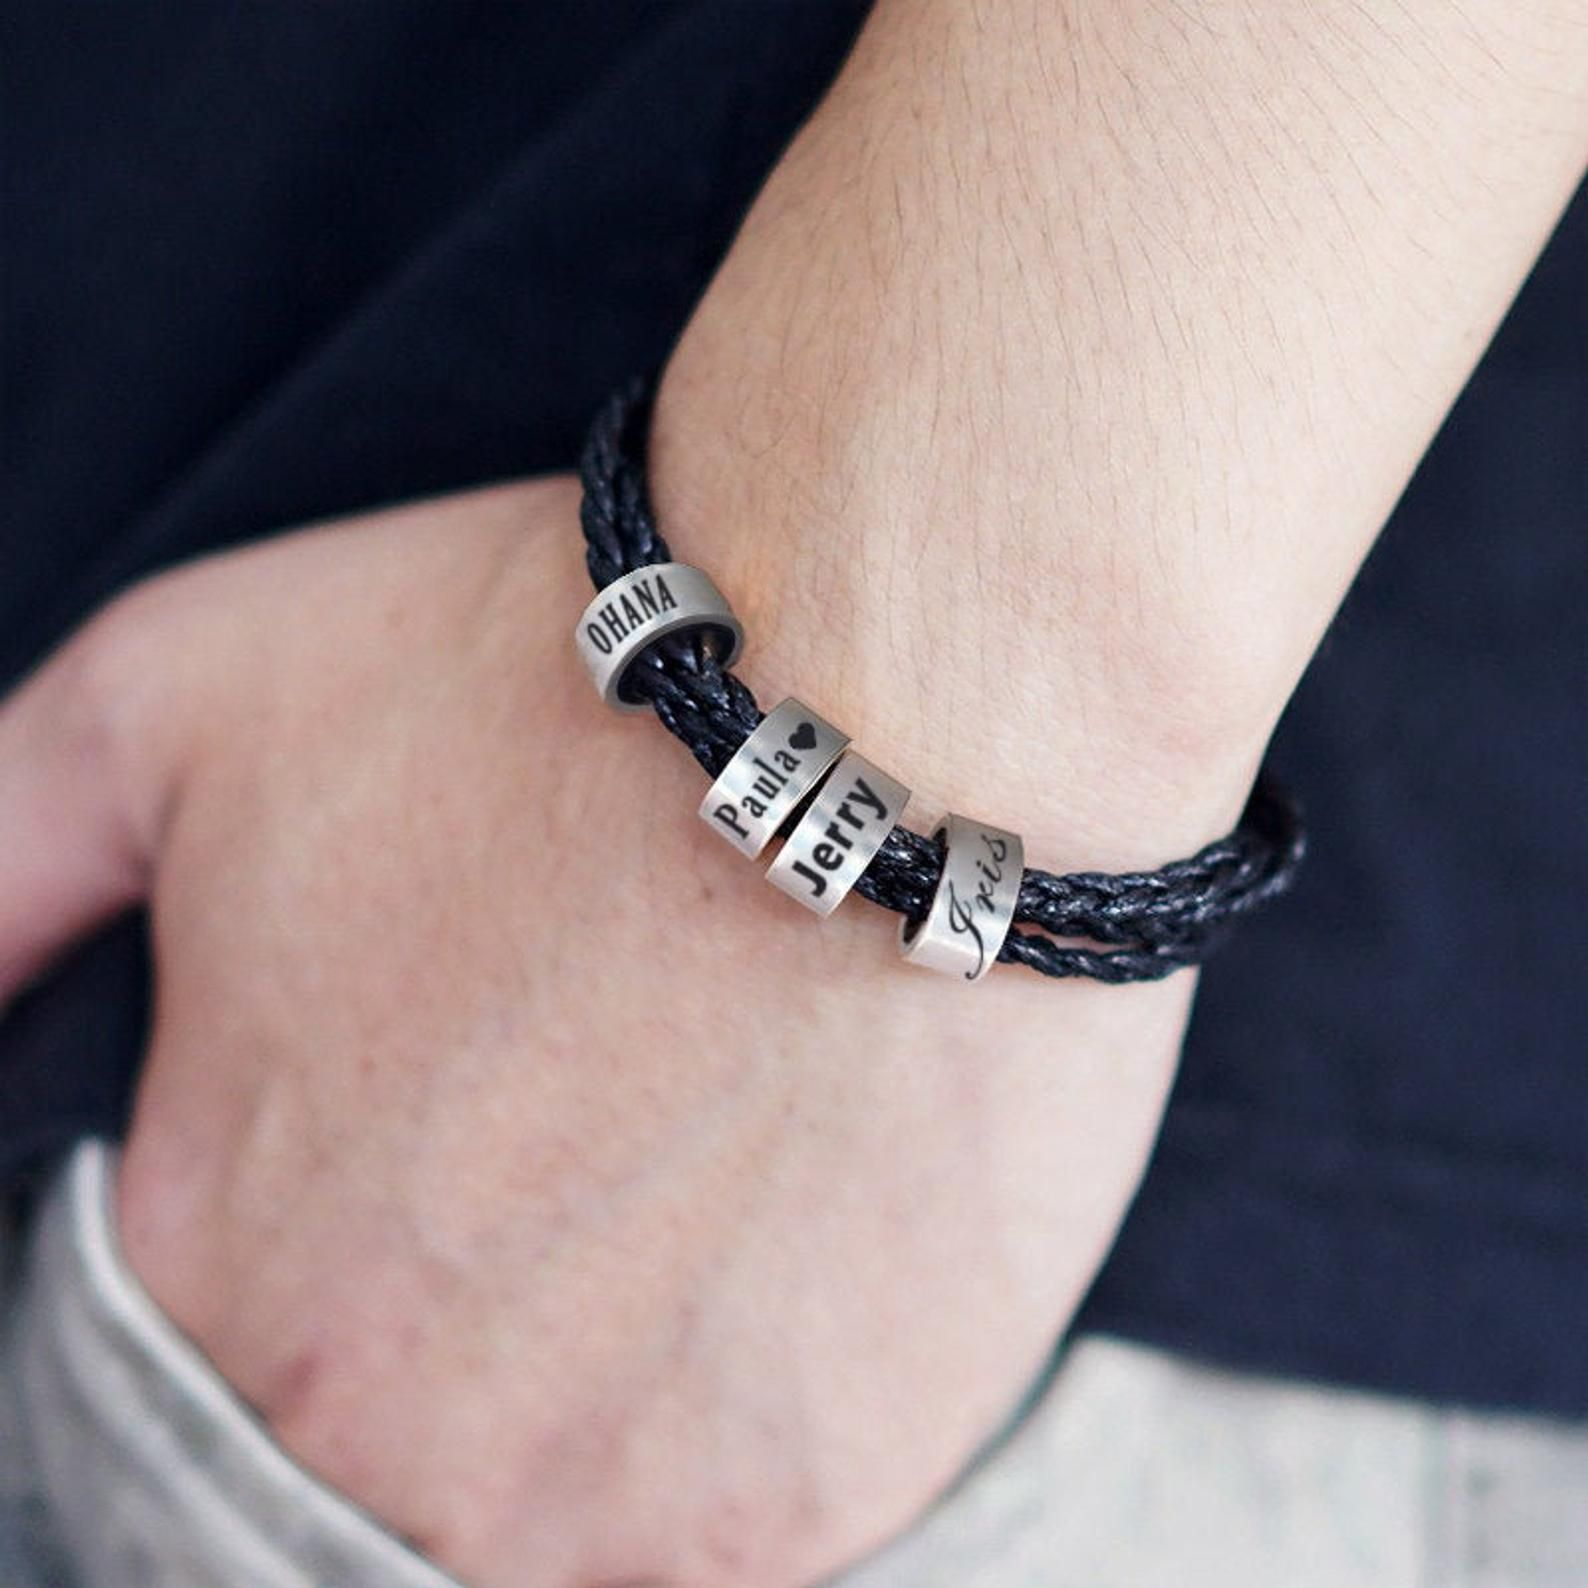 Personalized Mens Leather Bracelet, Custom Beads, Braid Name Charm Bracelet,  Custom Men Leather Bracelet, Bracelet for Men with Family Names | Braided leather  bracelet, Personalized leather bracelet, Personalized mens leather bracelet